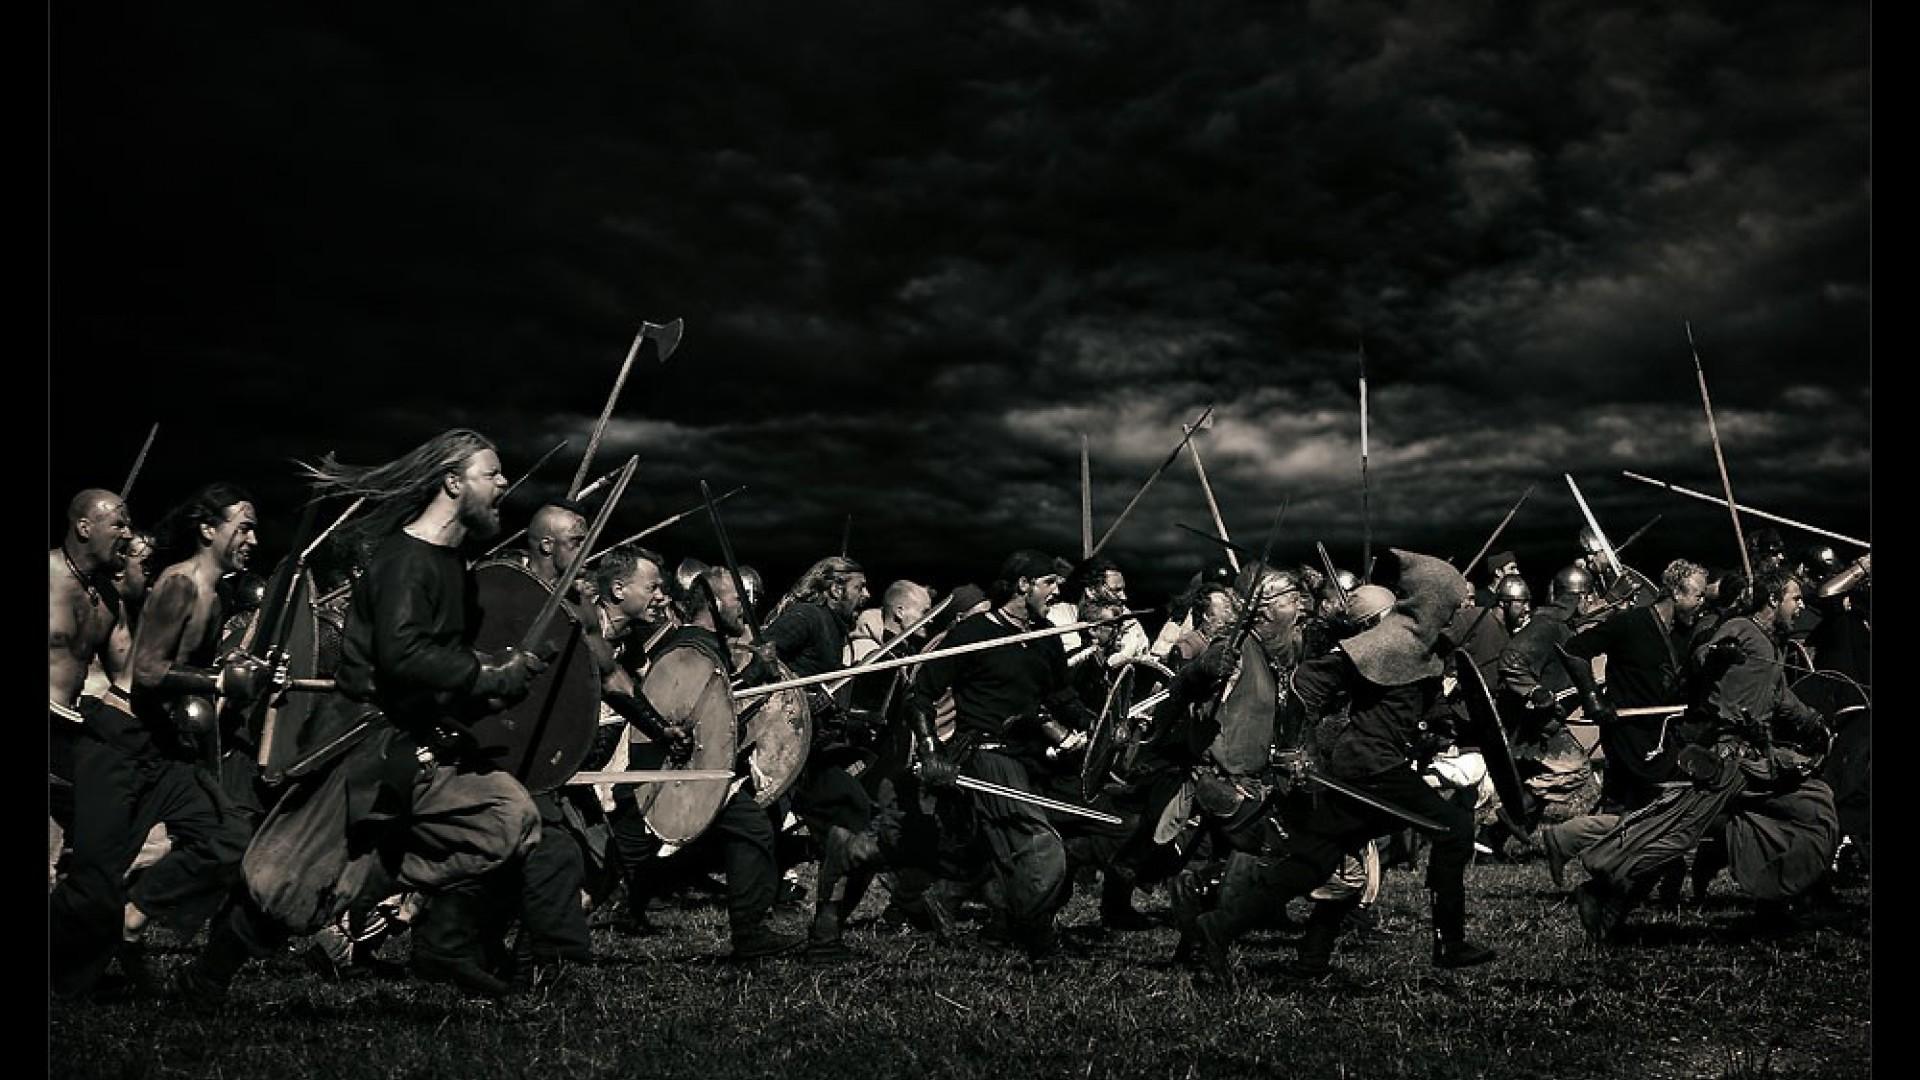 Fine Vikings Wallpapers, Vikings 4K Ultra HD Pictures – HX3606369